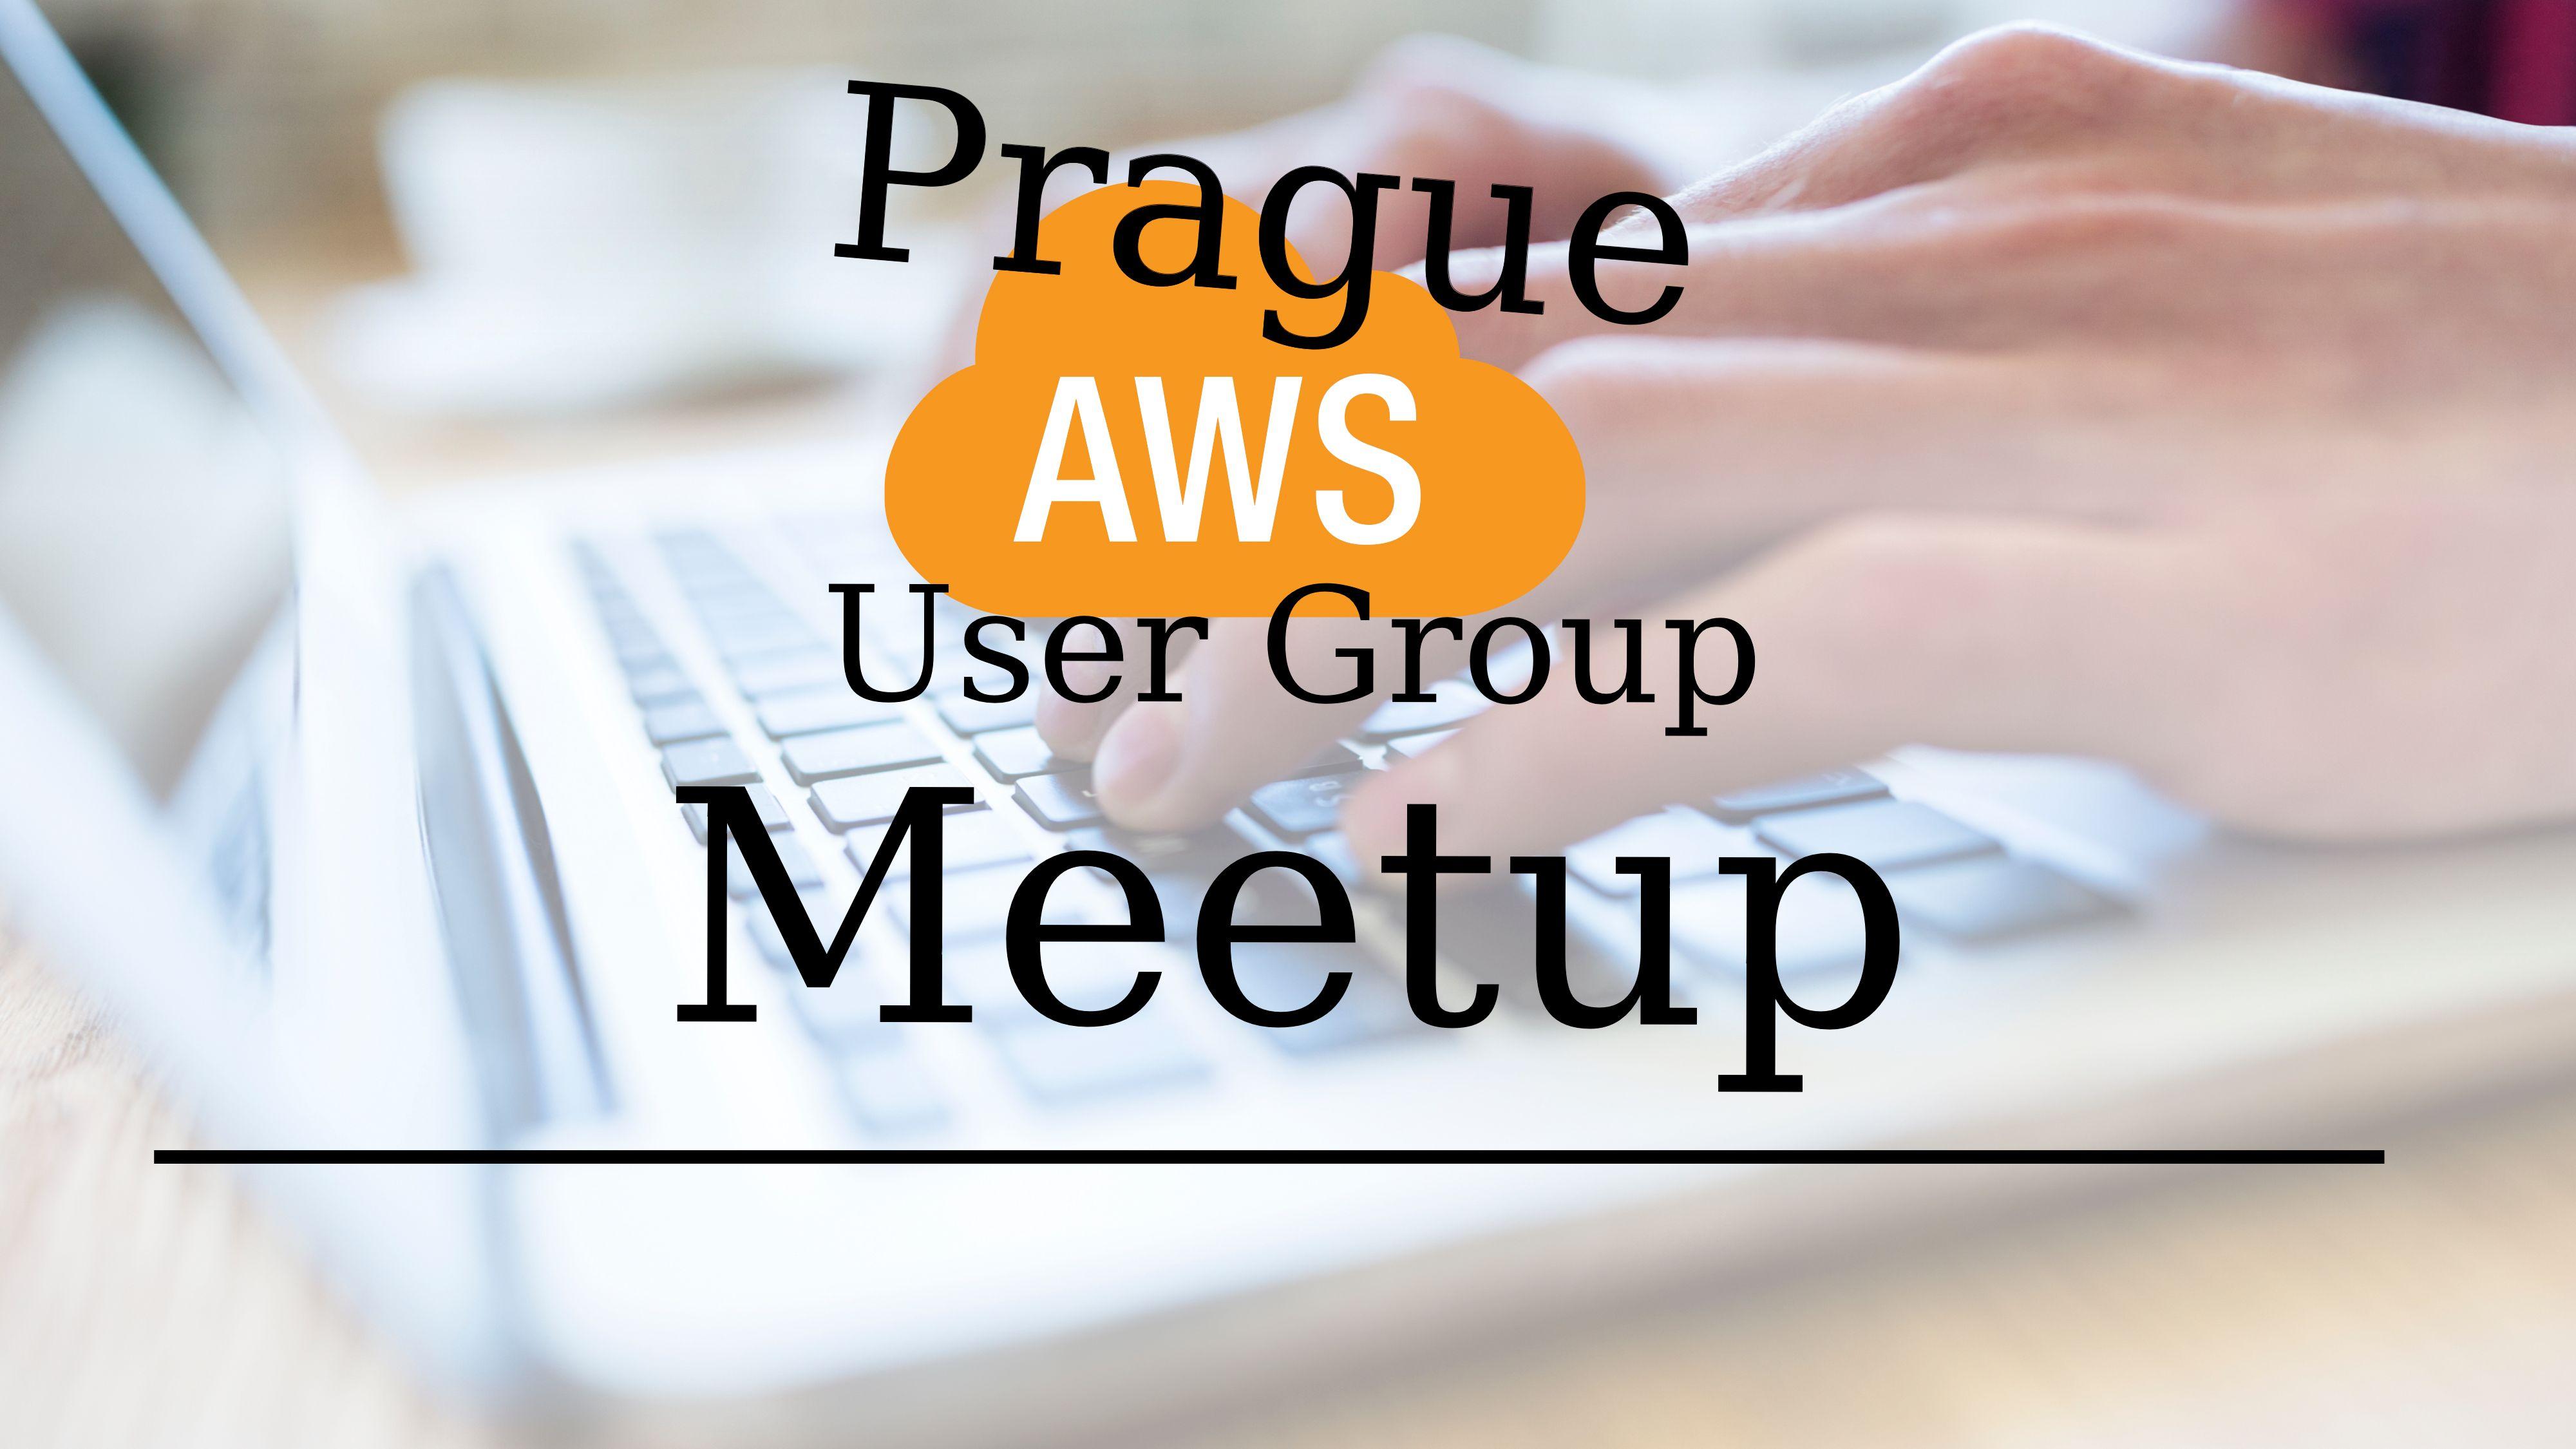 Prague AWS User Group